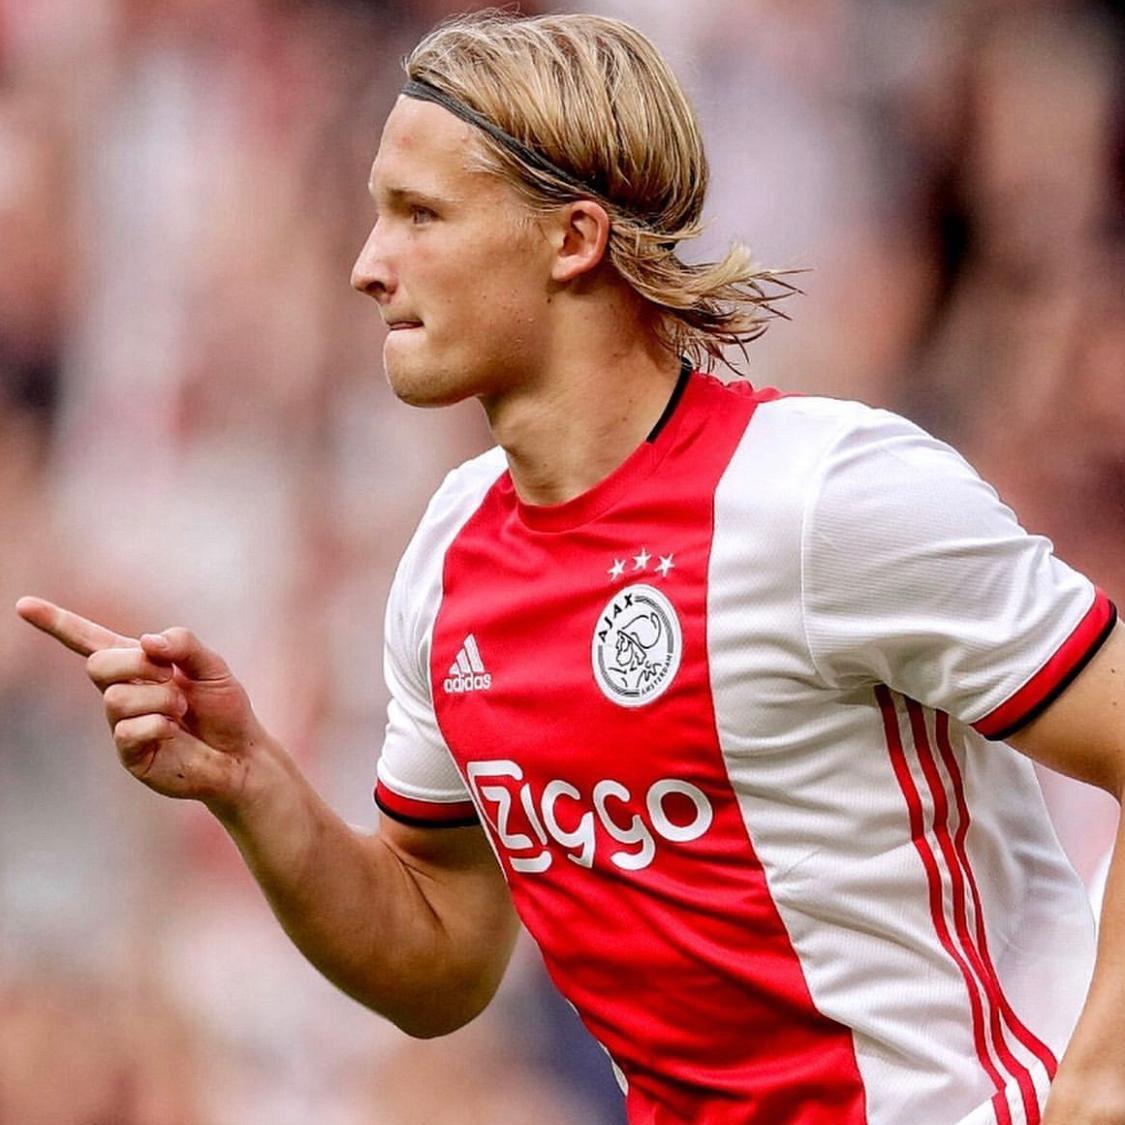 Watch Ajax wonderkid and Man United target Kasper Dolberg